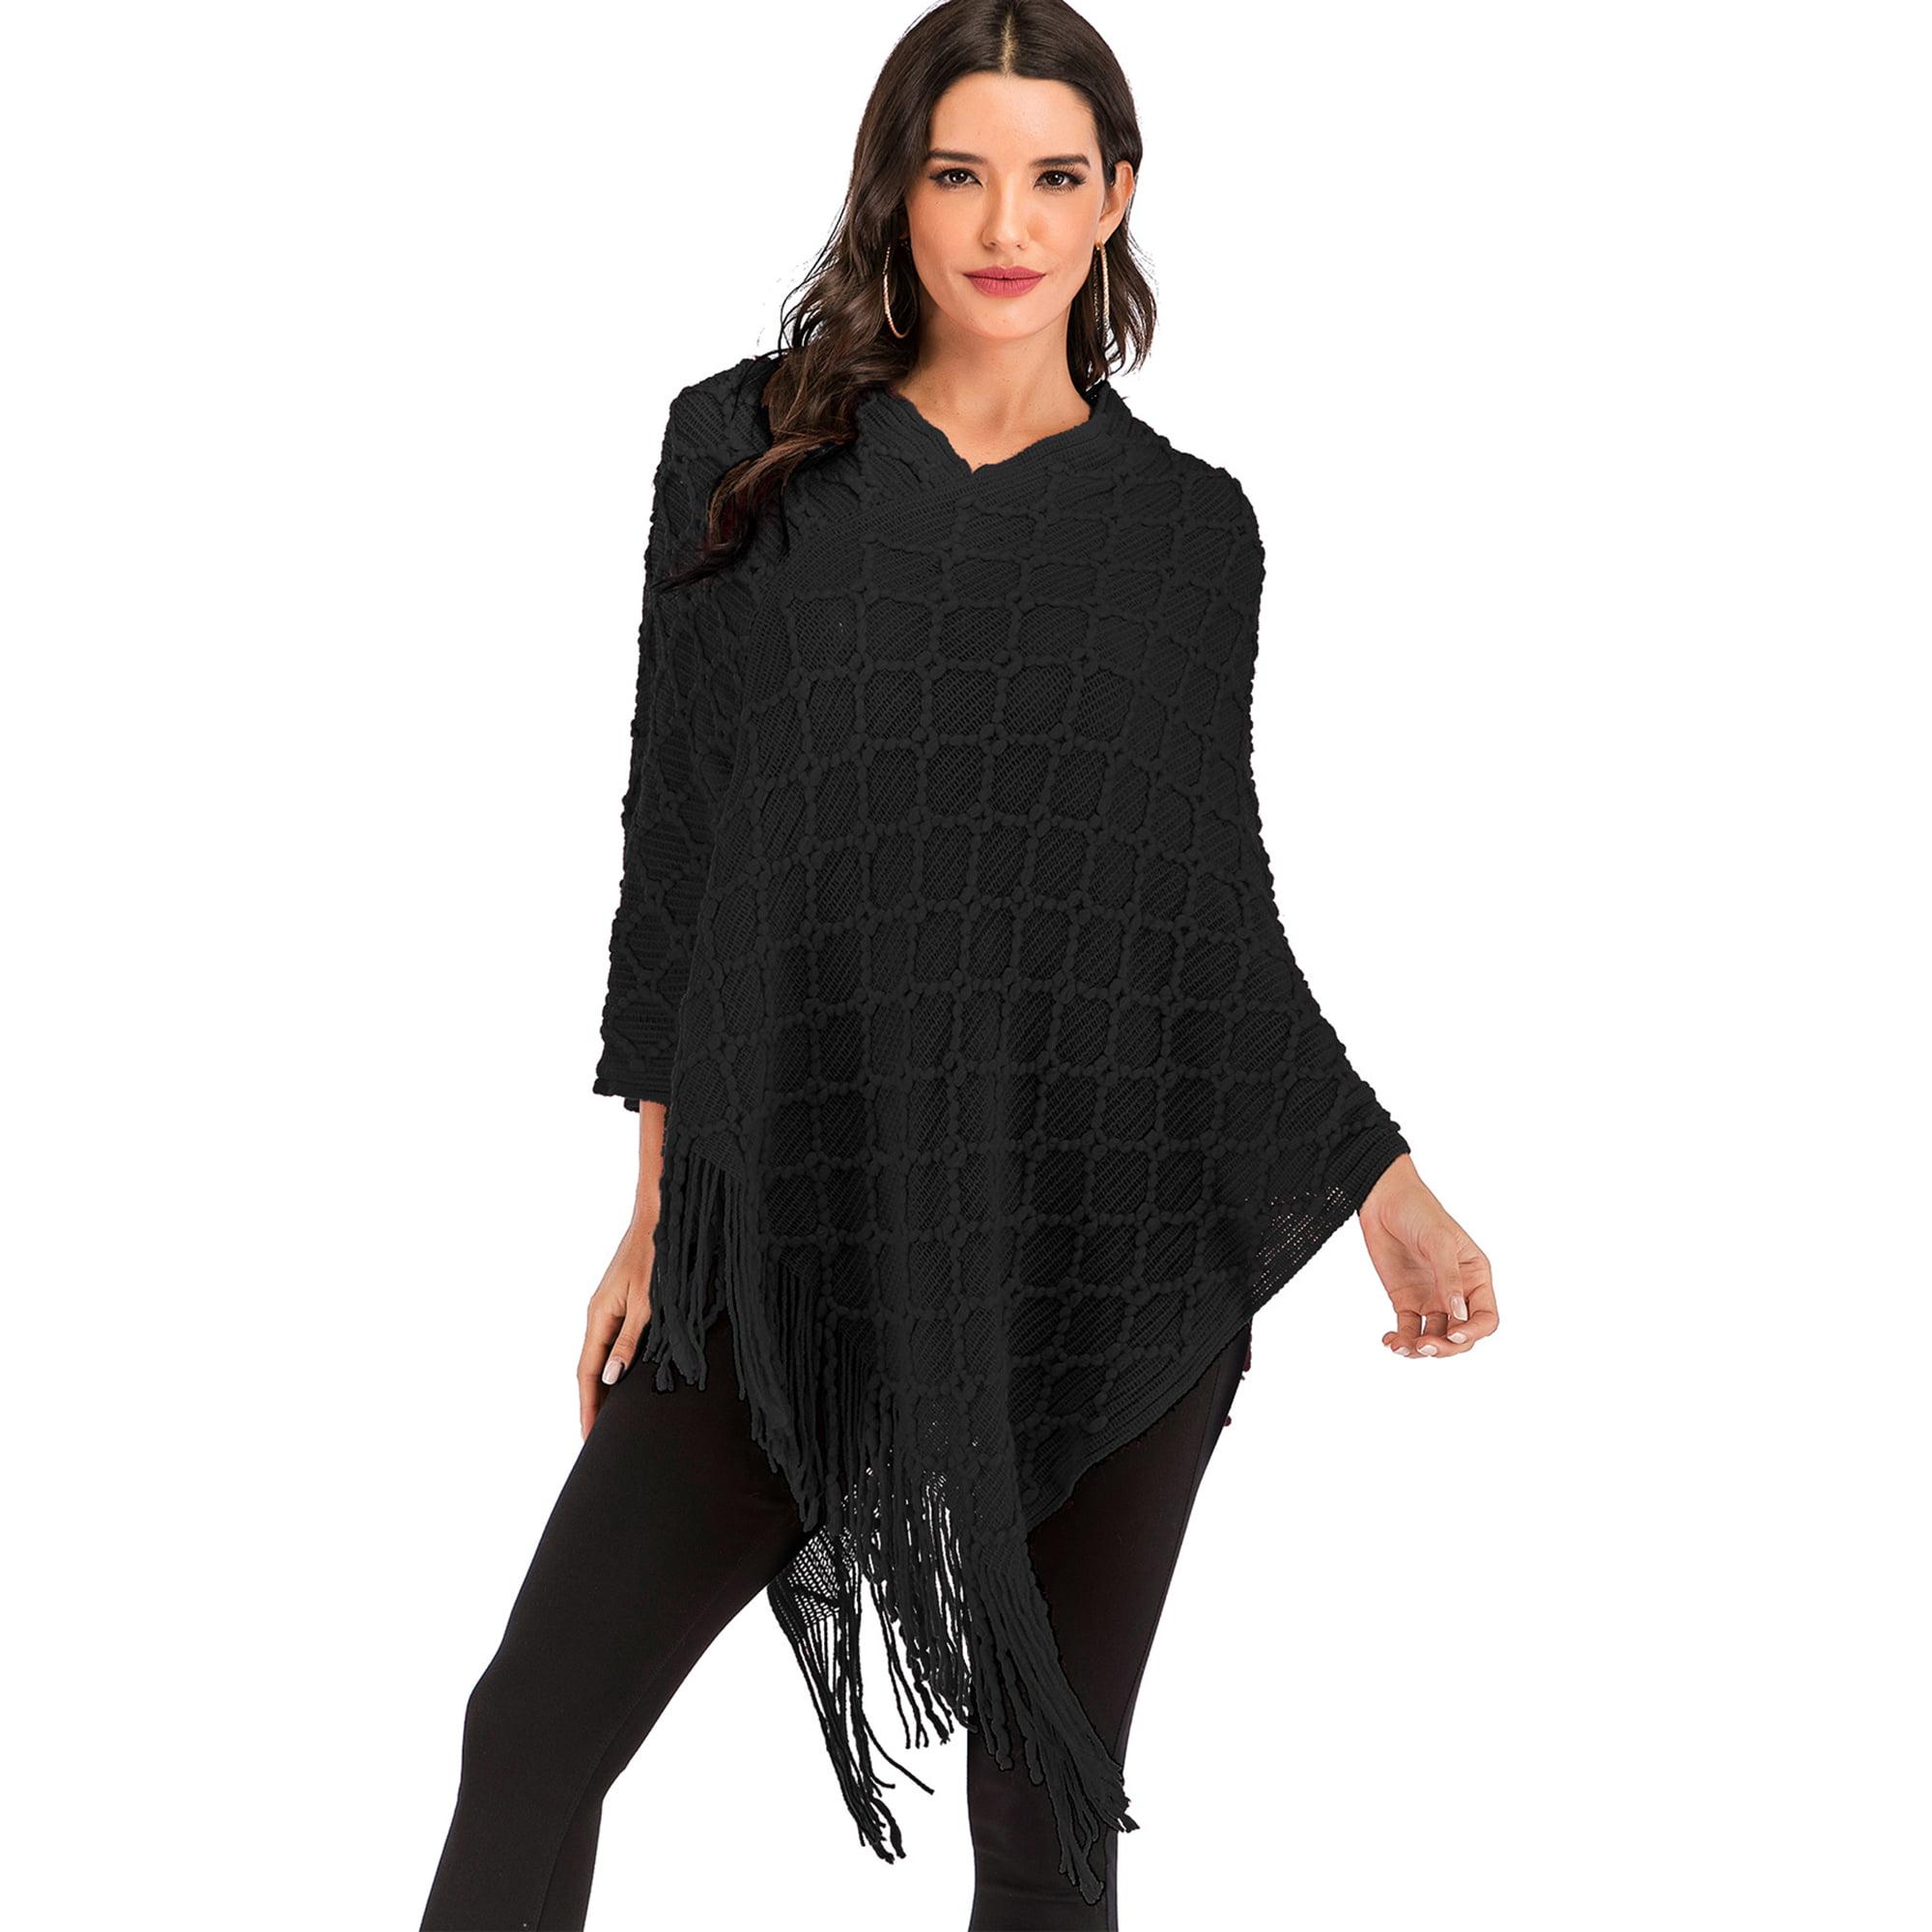 Sayfut Womens Chic Asymmetrical Crochet Knitting Batwing Poncho Sweater With Fringe Long Sleeve Black Red Khaki Walmart Canada